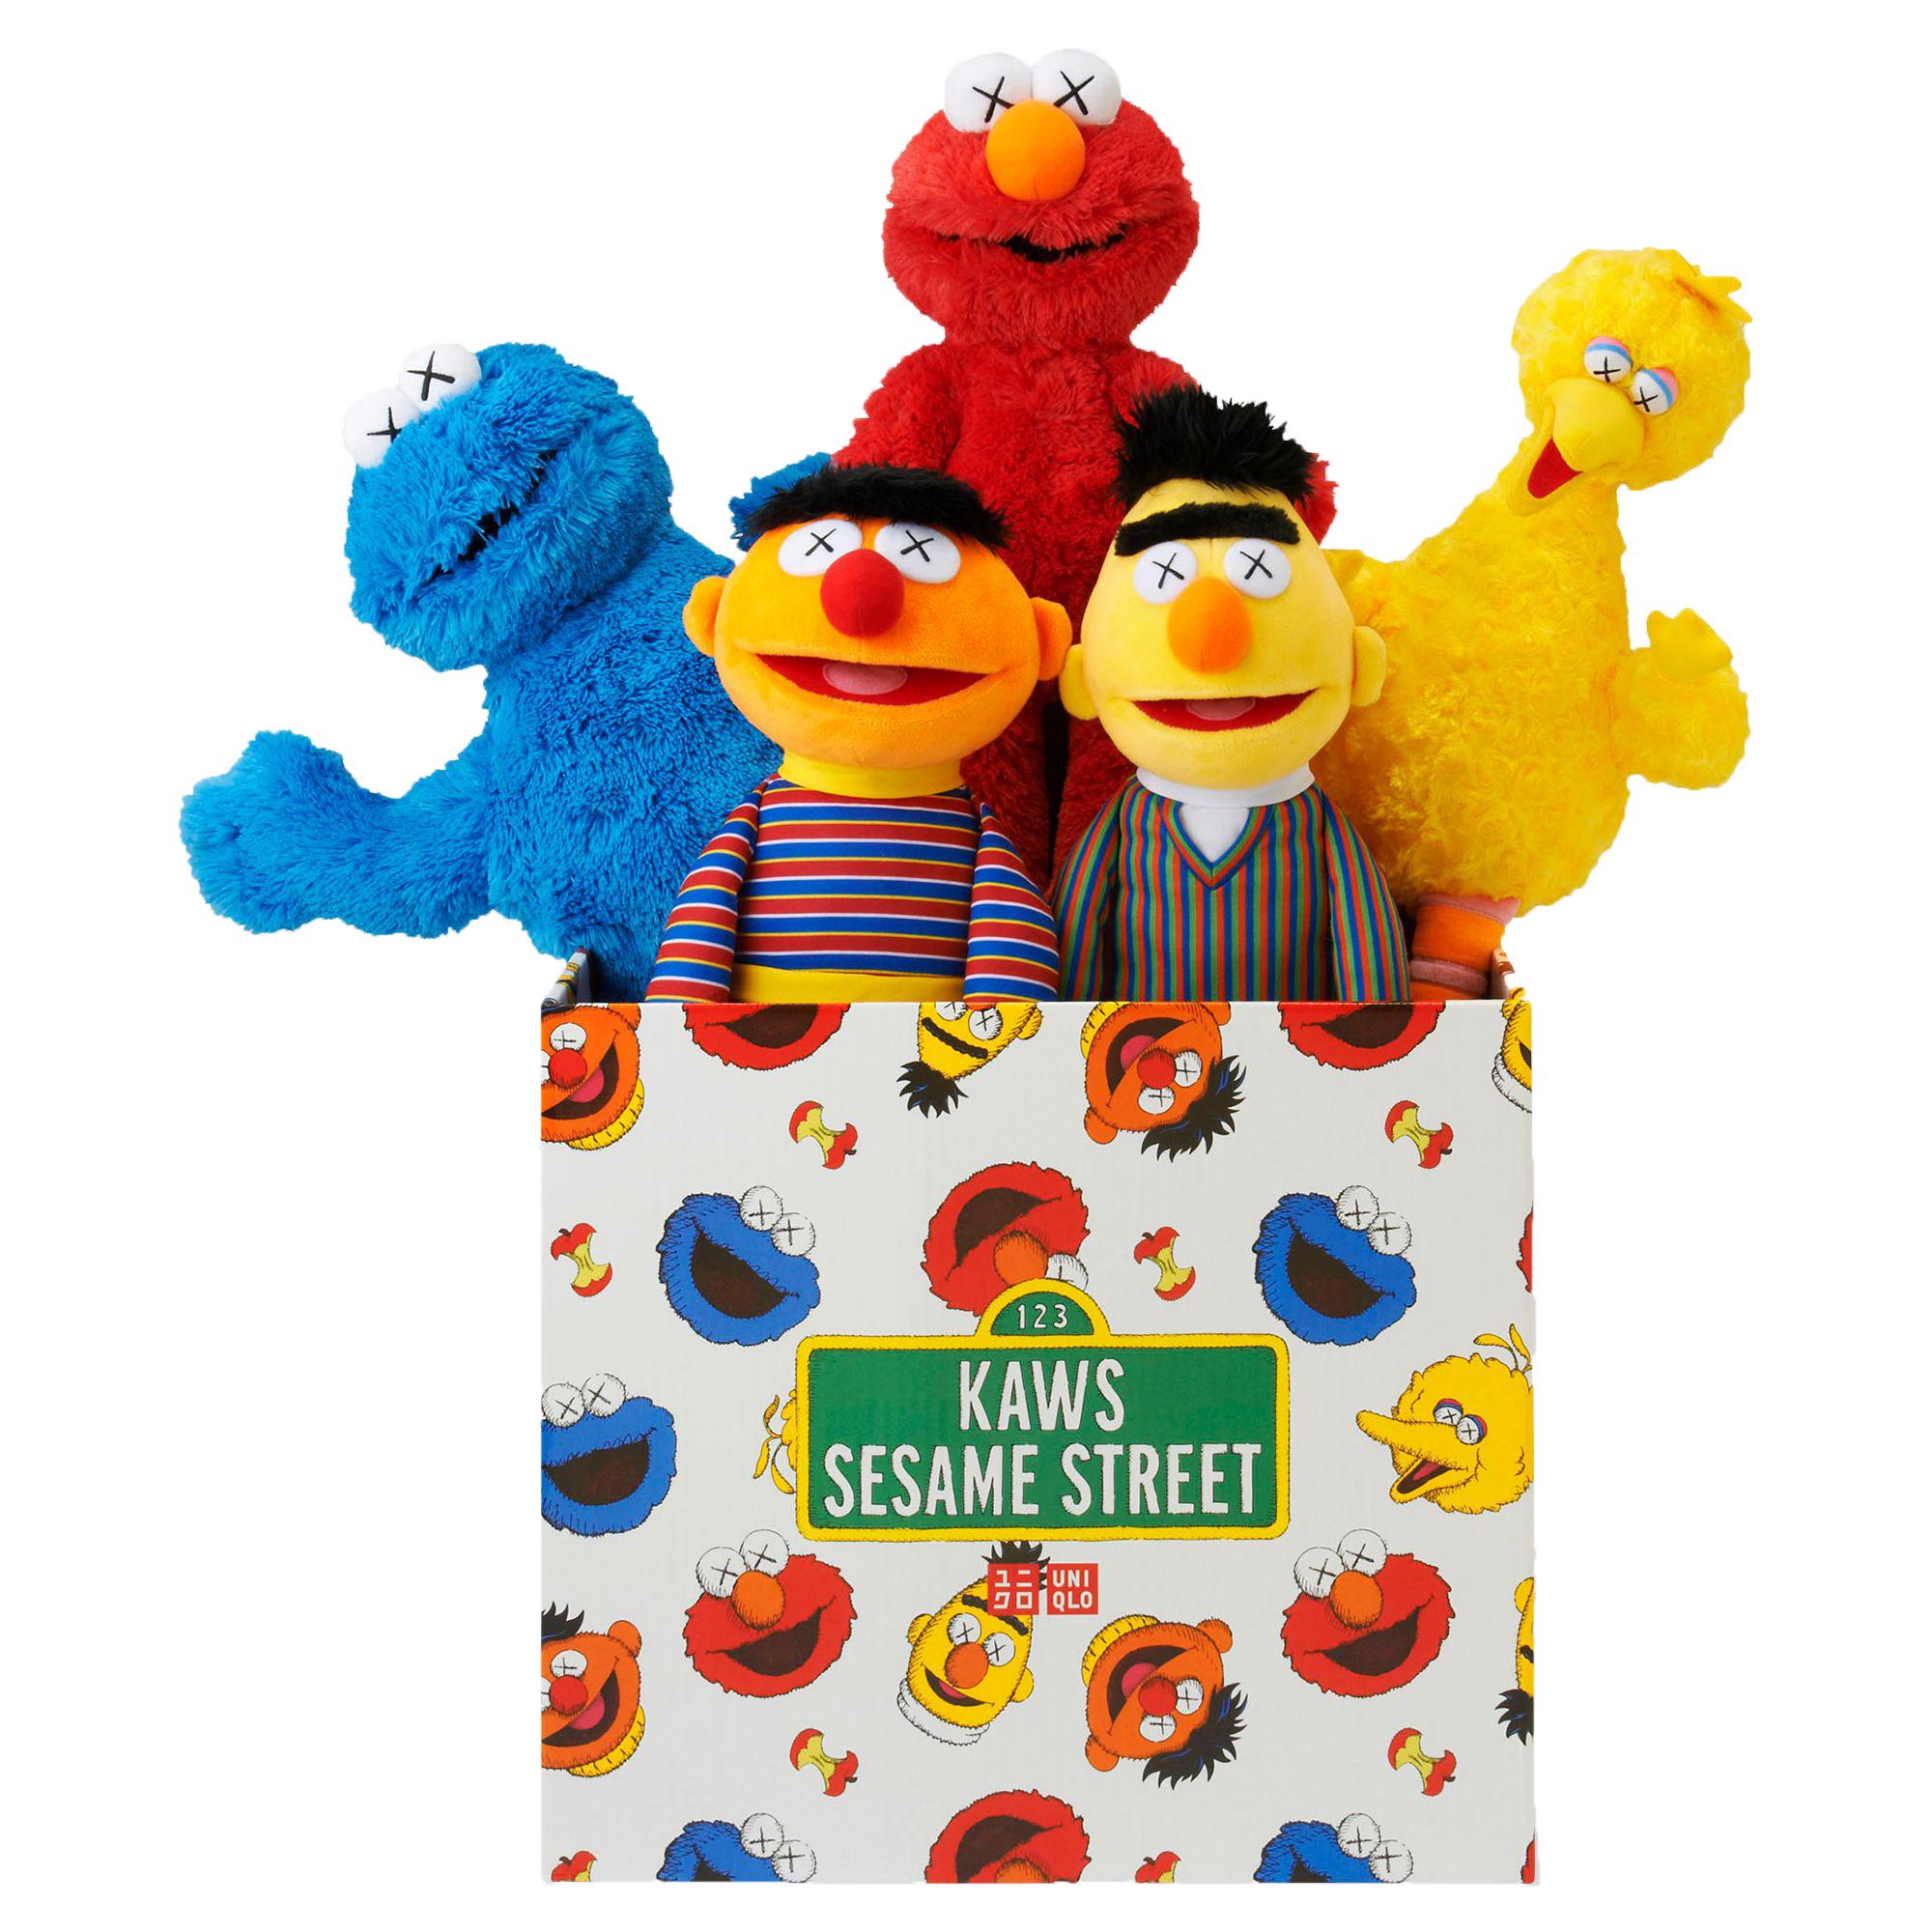 Kaws Sesame Street Uniqlo Plush Toy Complete Box Set Multi